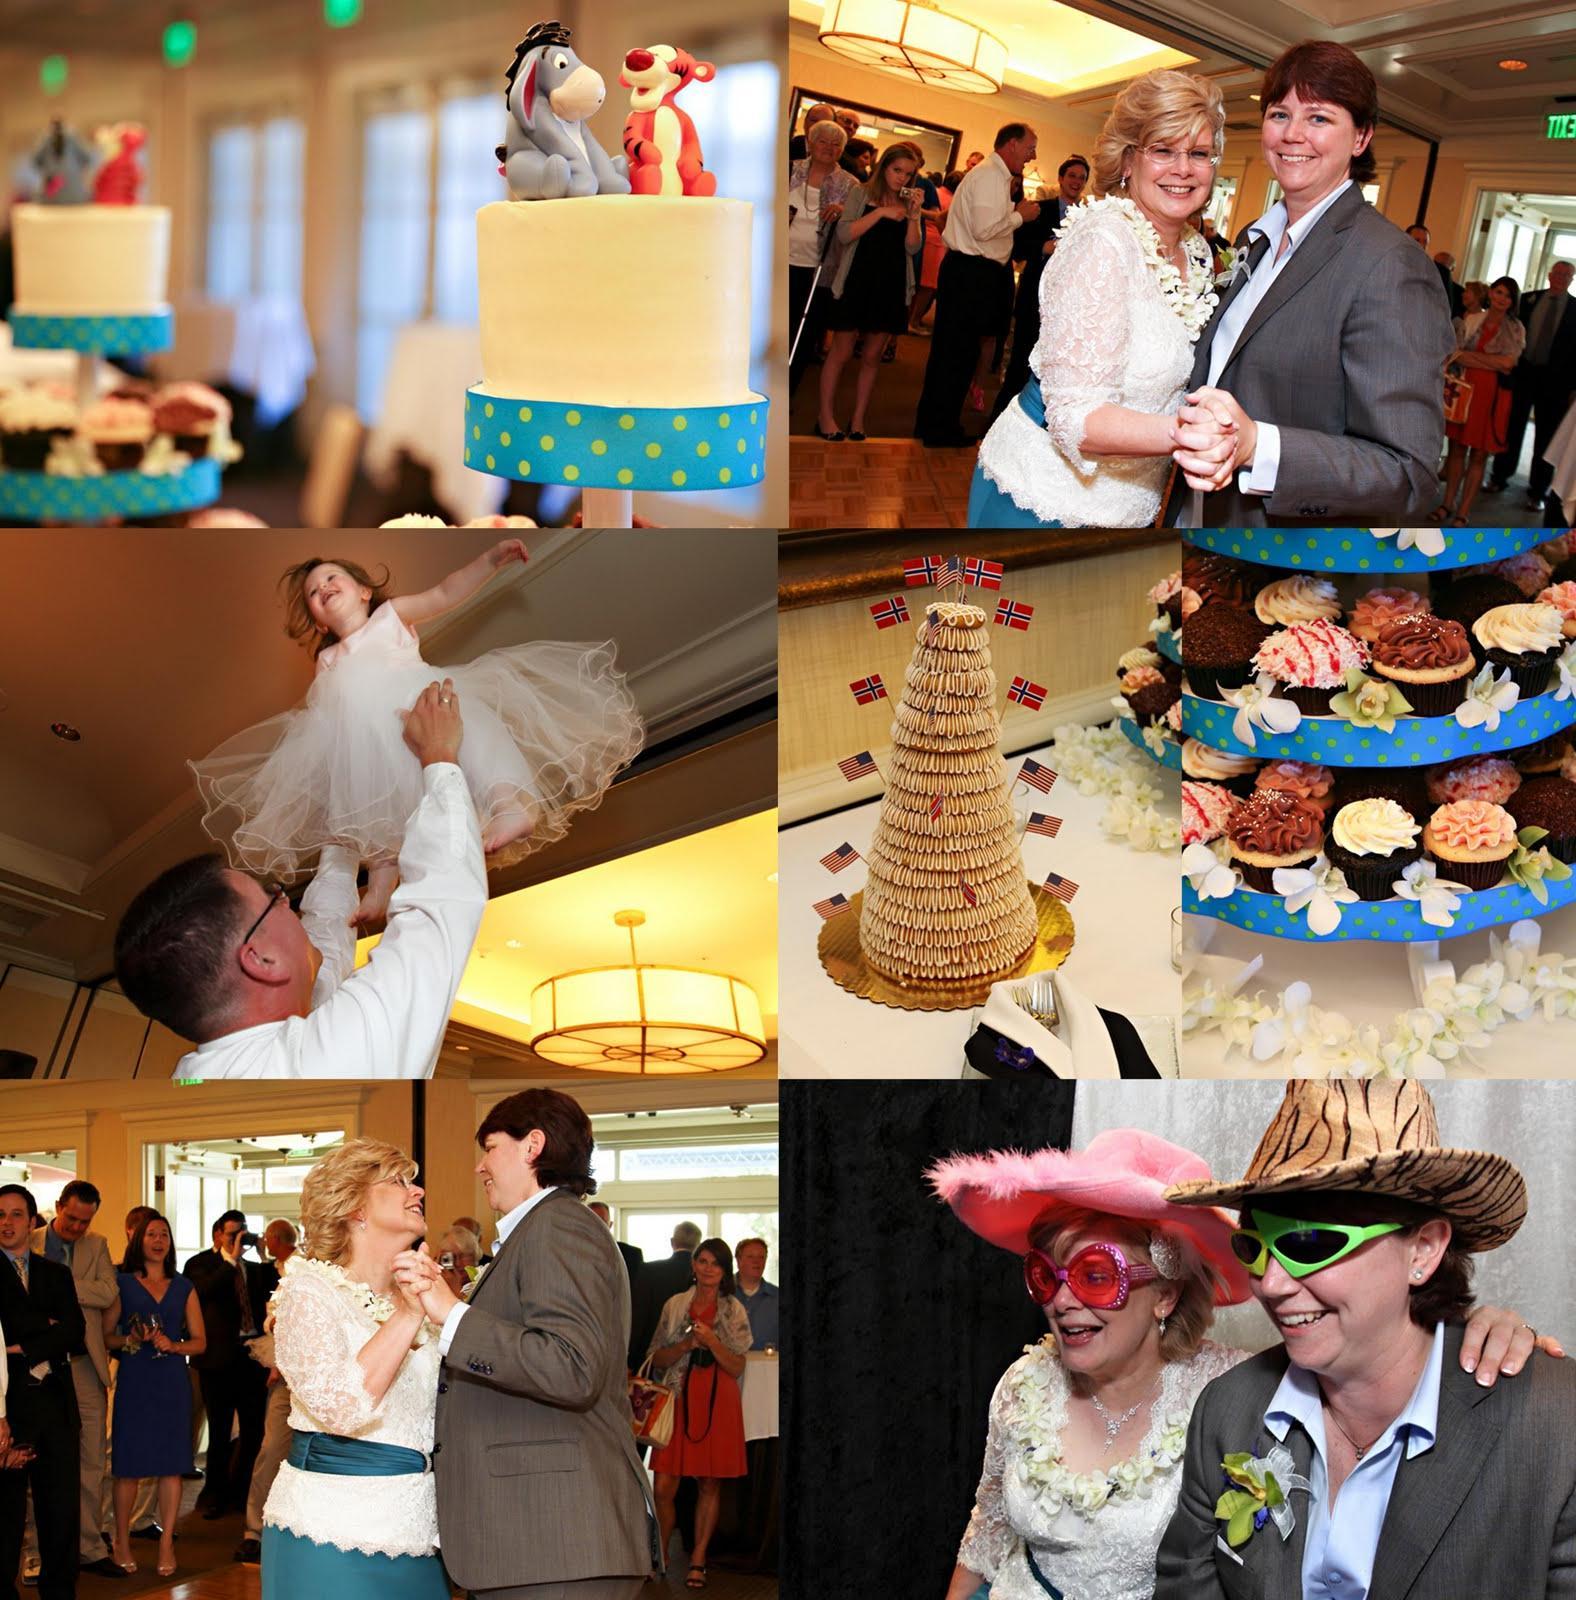 Norwegian wedding cake,